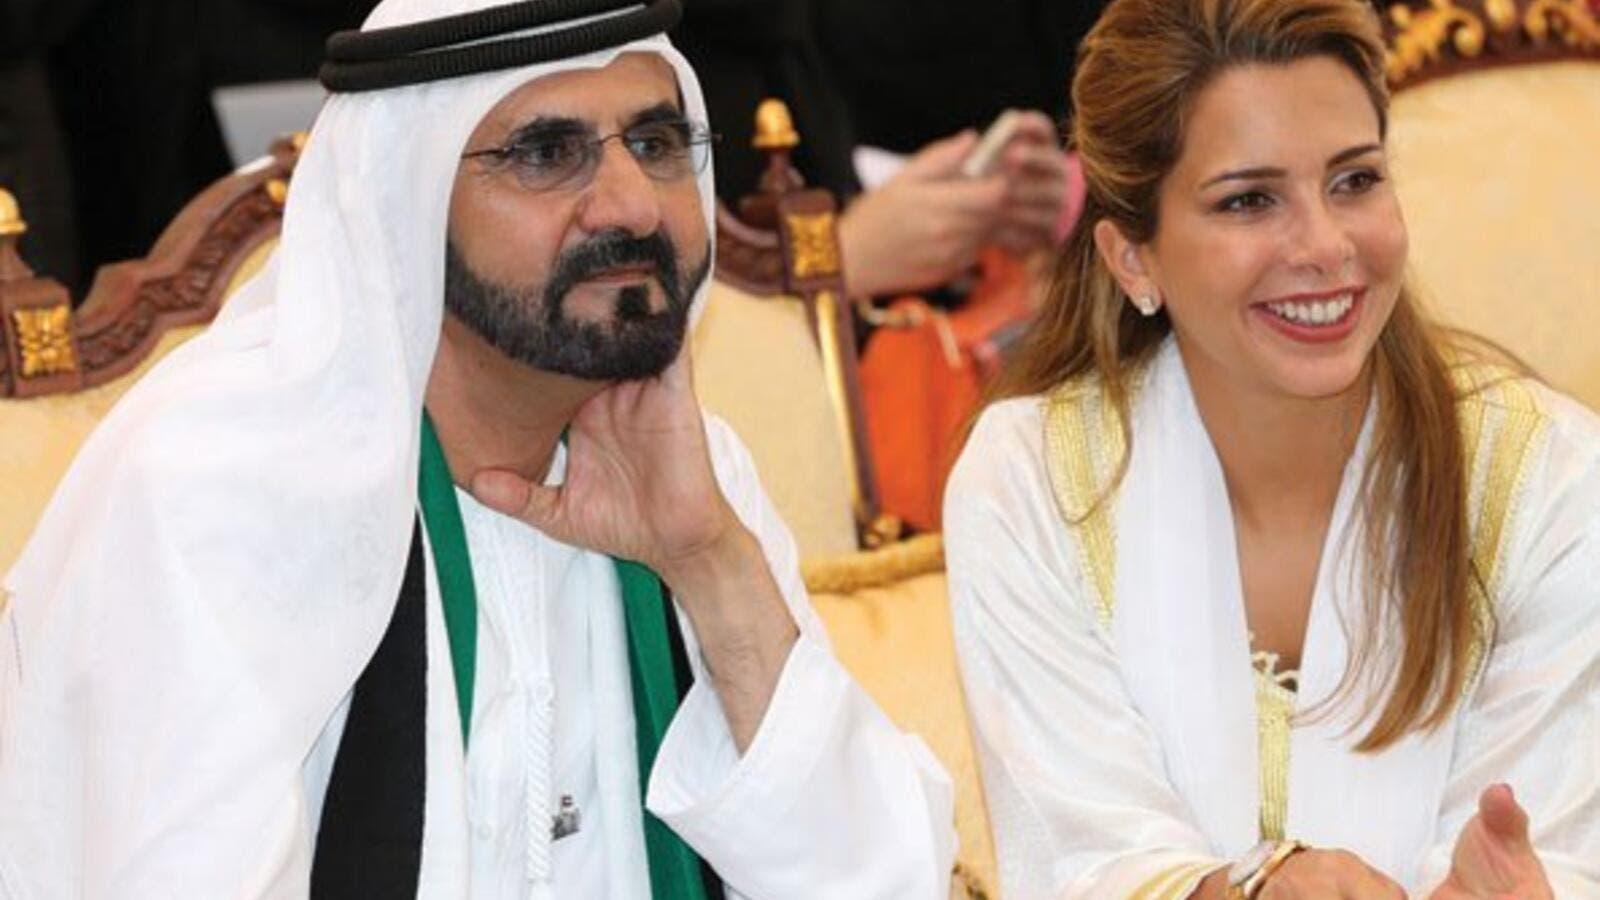 Fake Poem to Princess Haya by Dubai's Ruler Shared Online | Al Bawaba